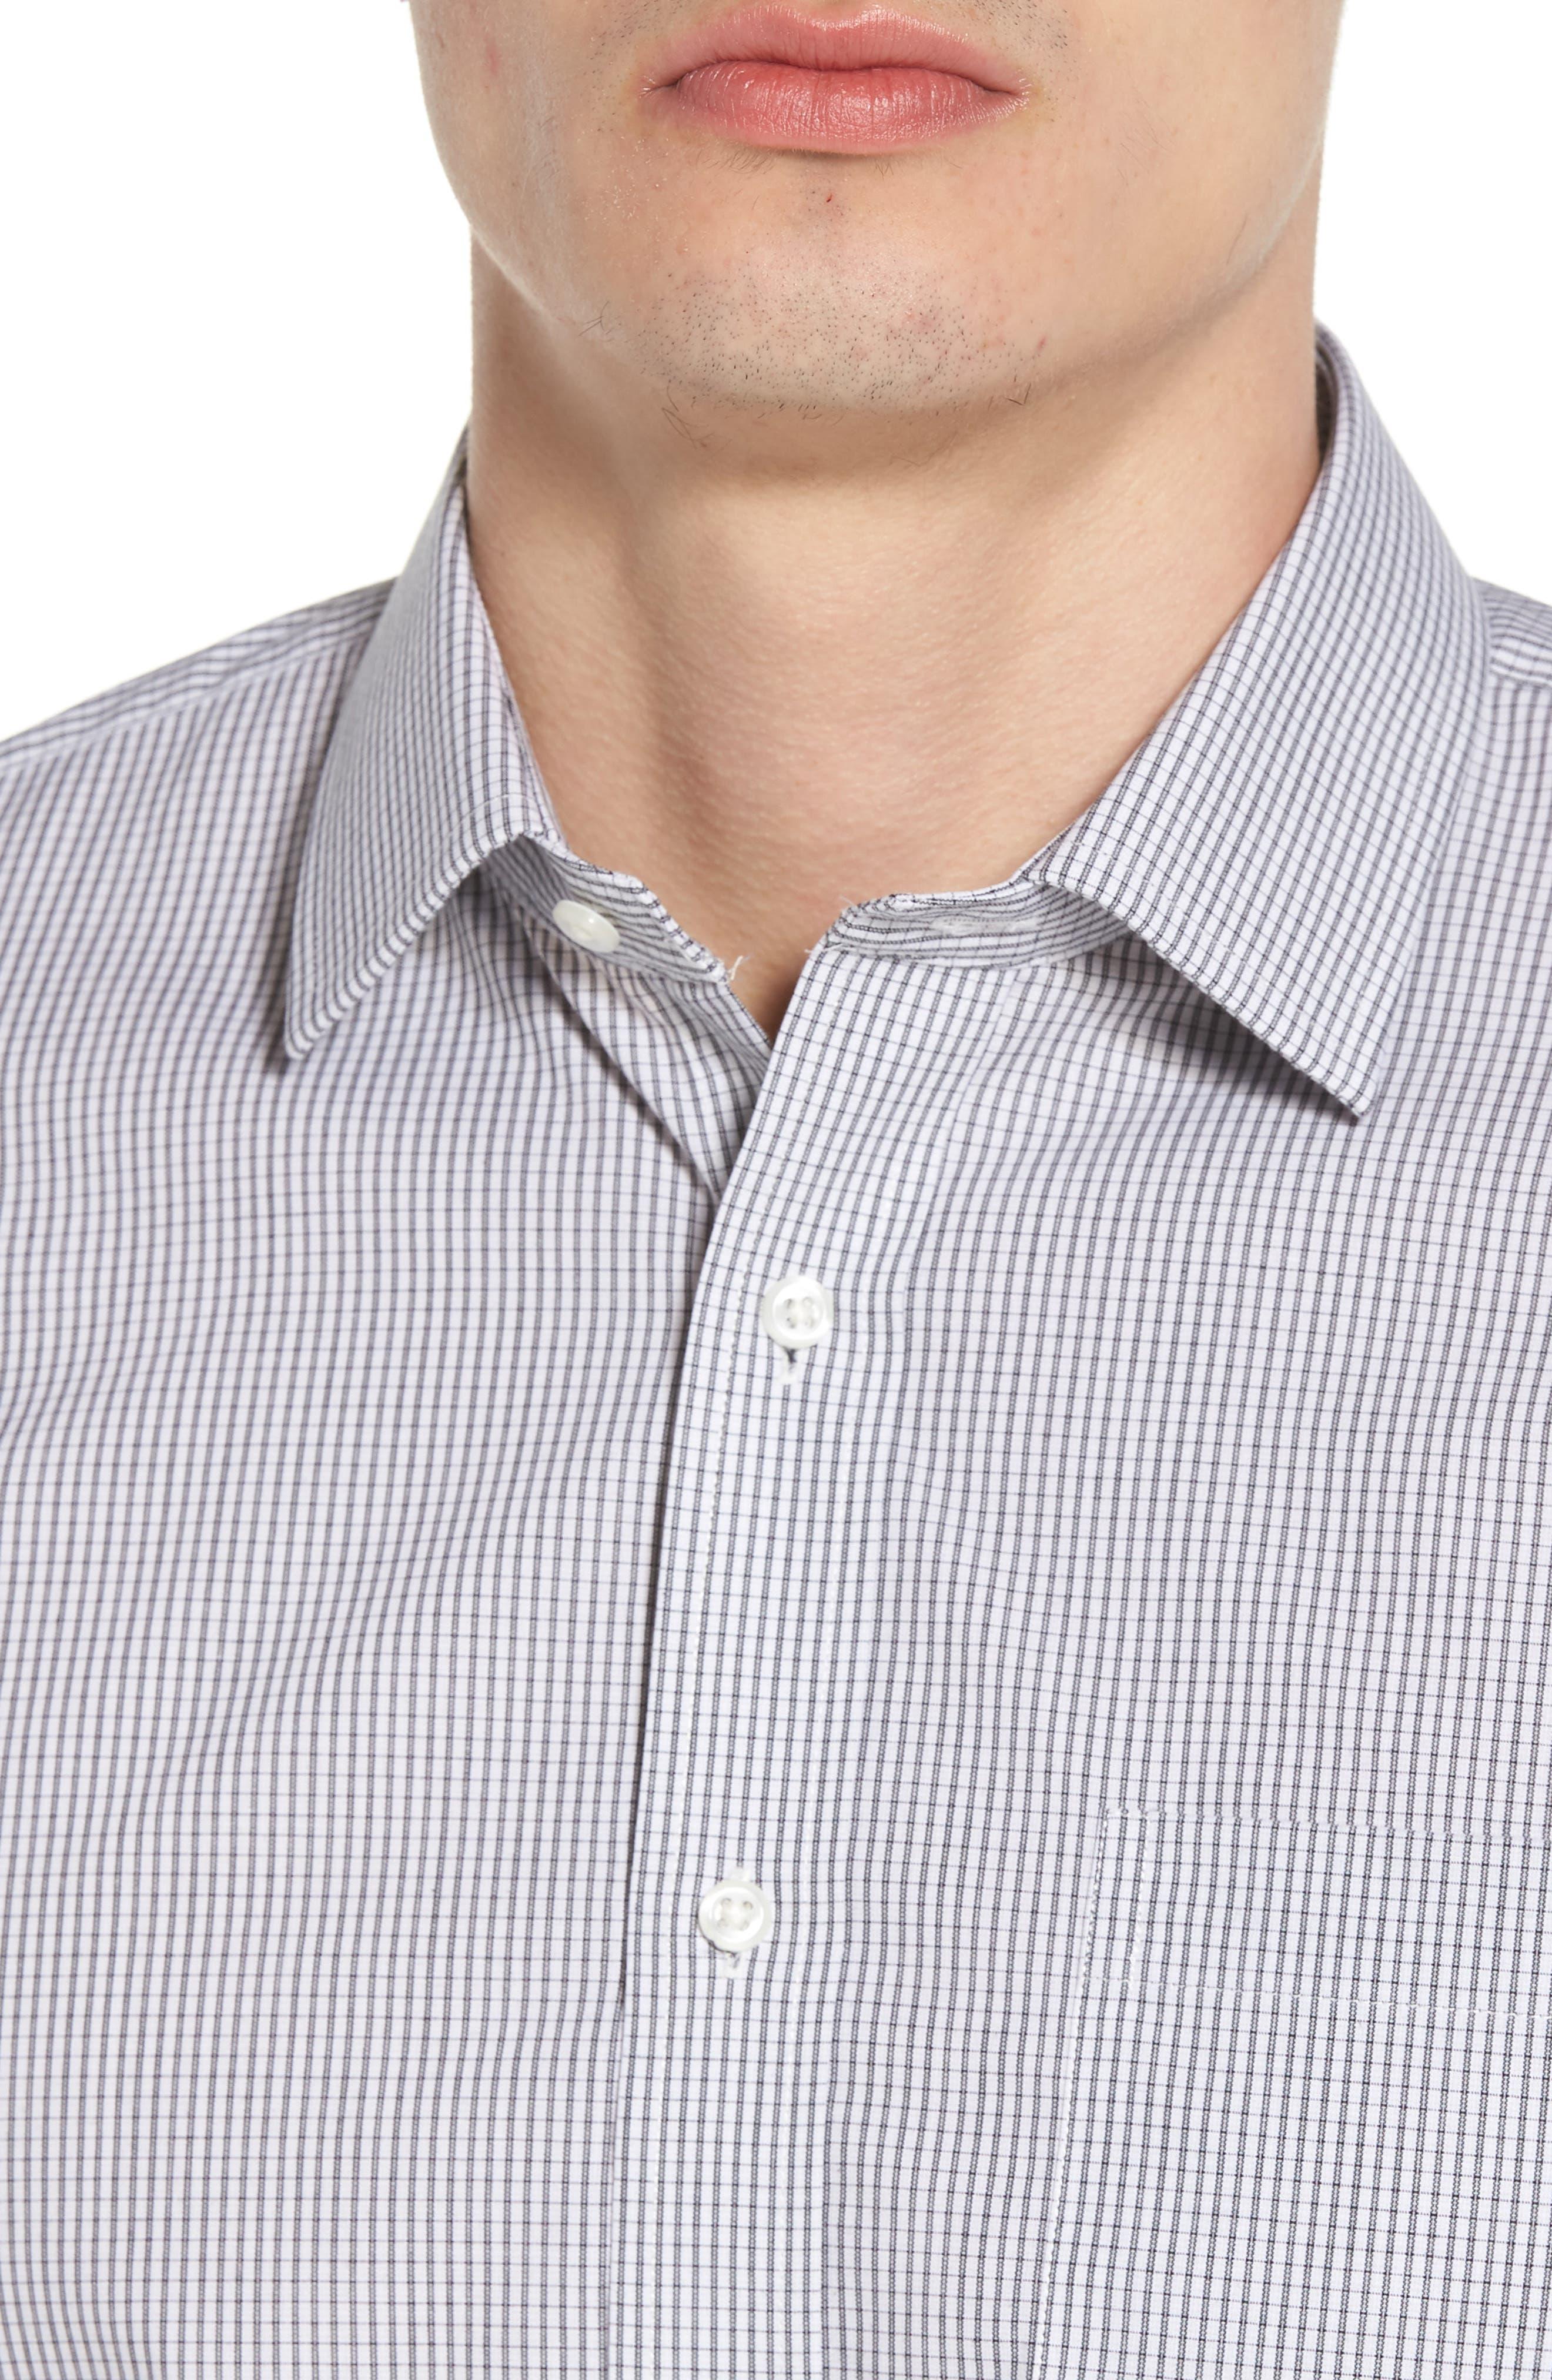 Trim Fit Non-Iron Check Dress Shirt,                             Alternate thumbnail 2, color,                             001